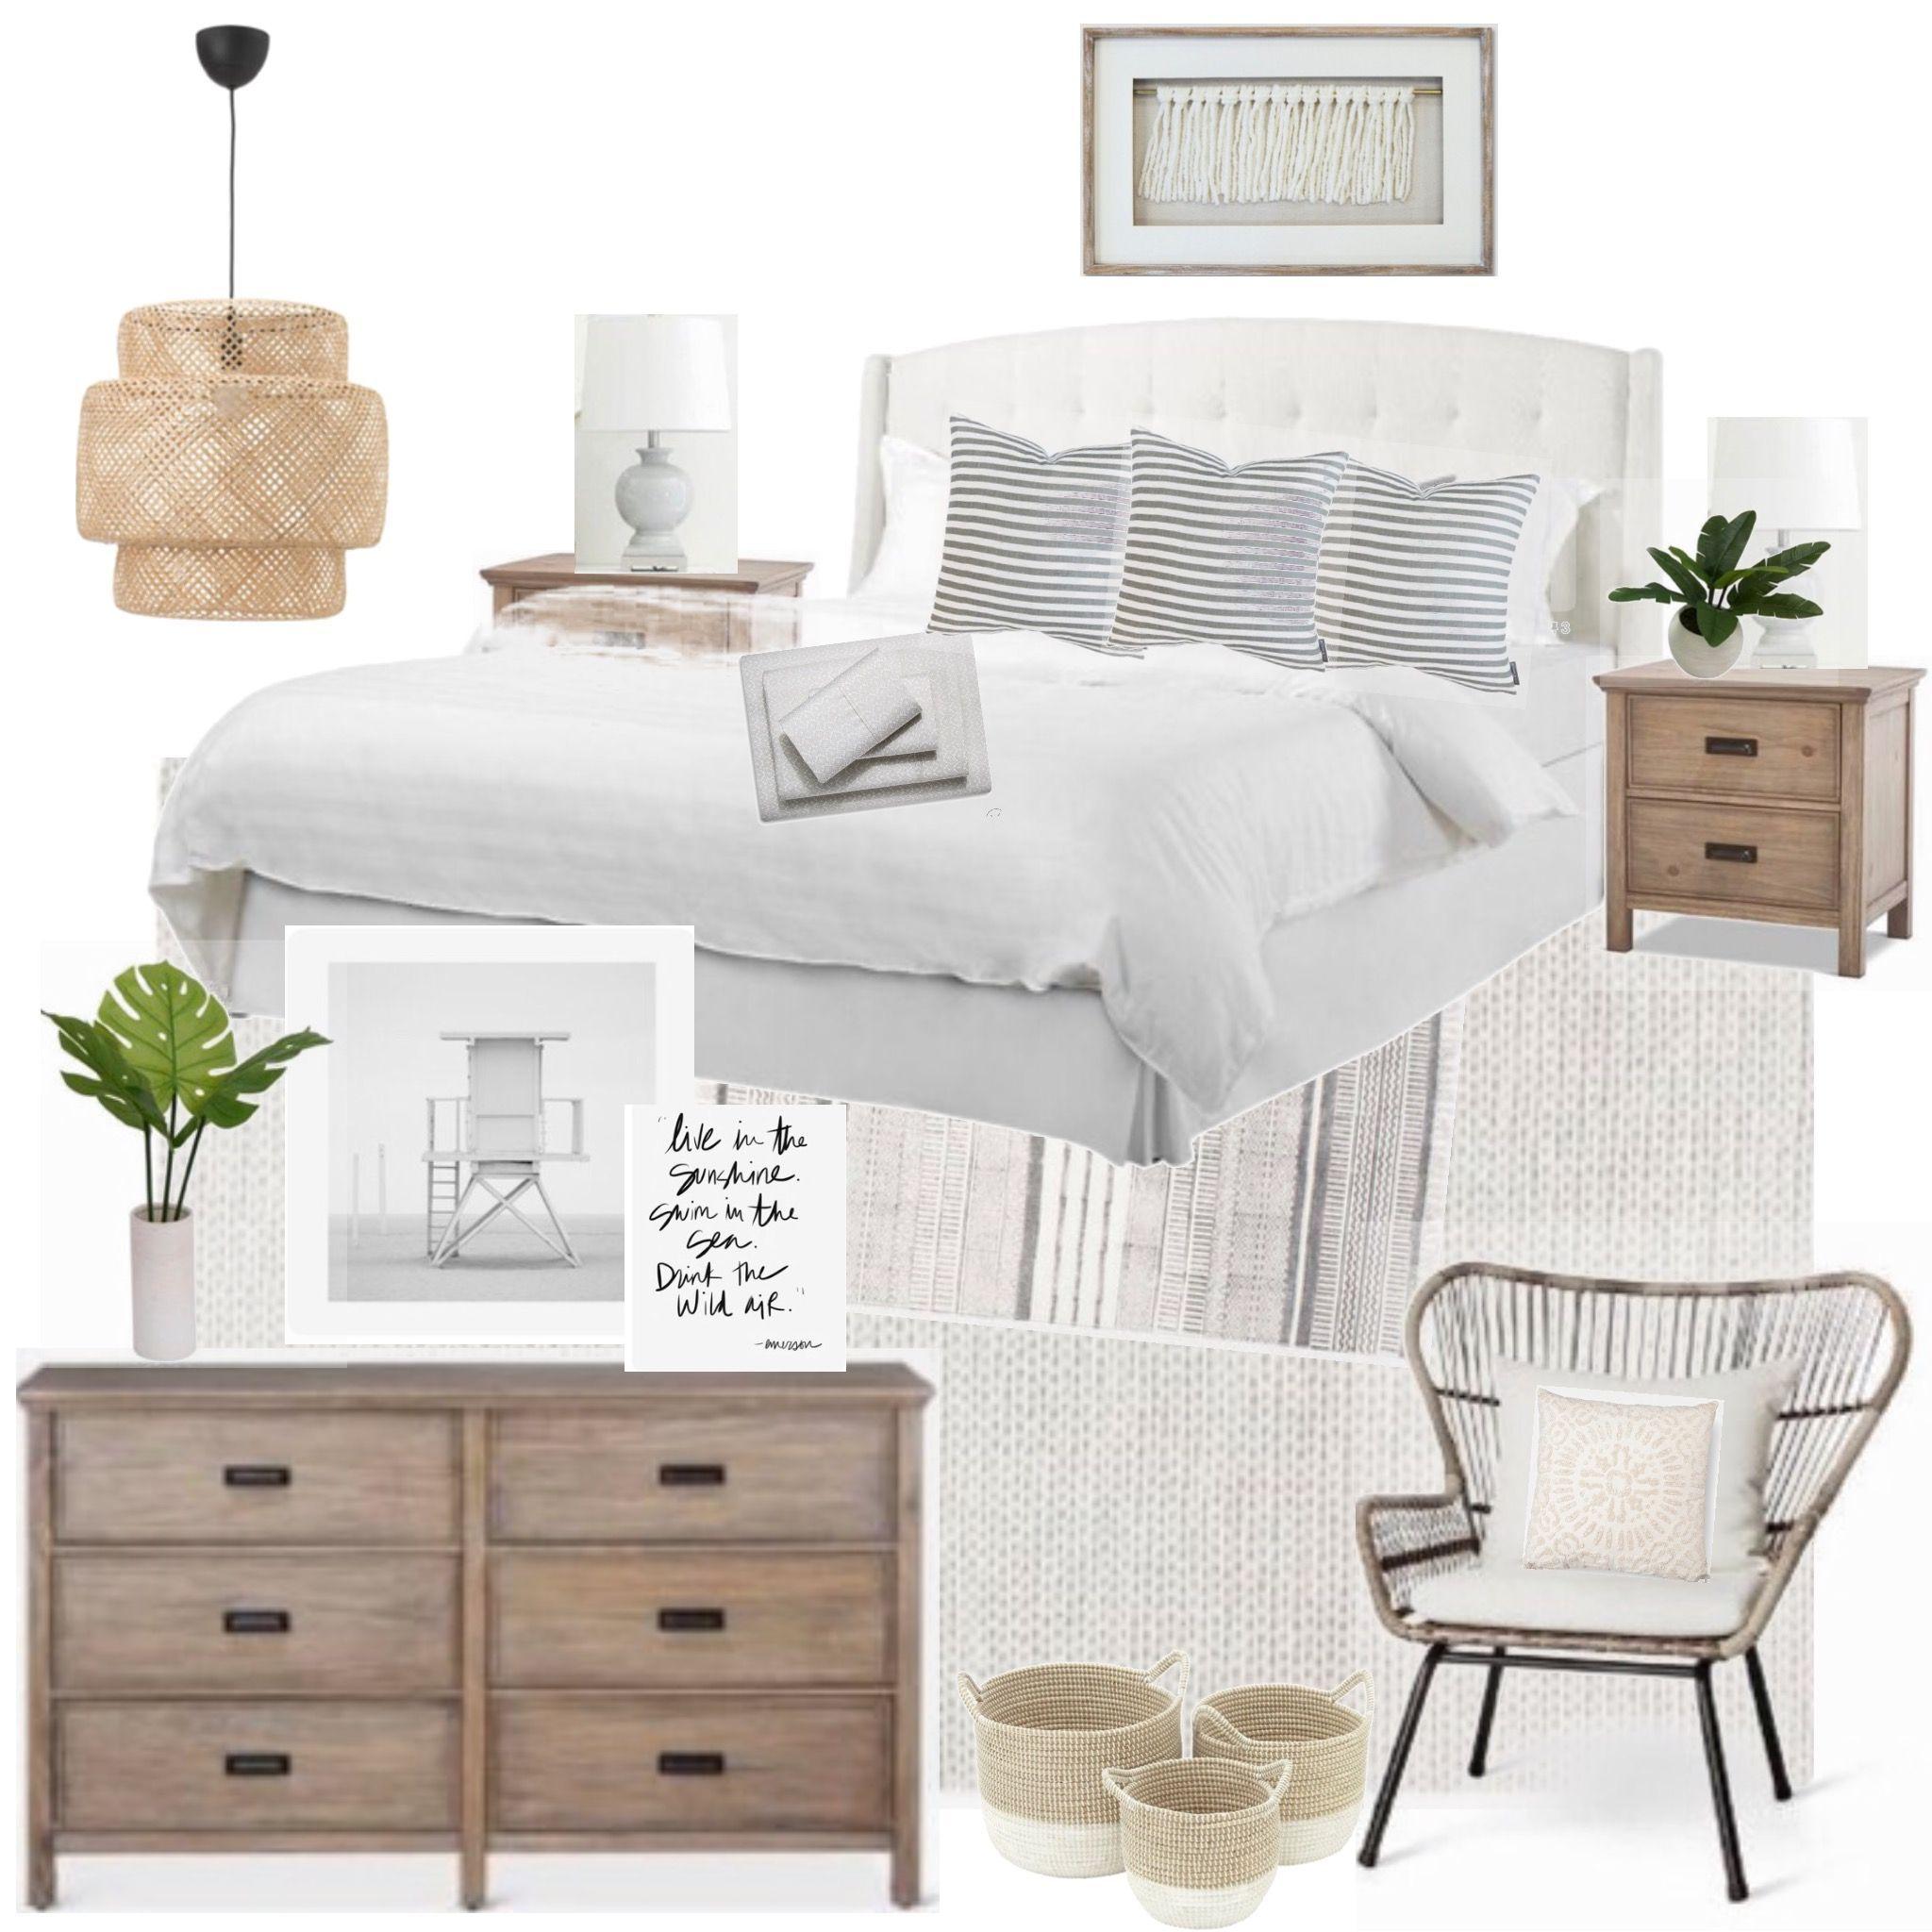 DesignSixtyFive Bedroom Mood Board modern coastal boho